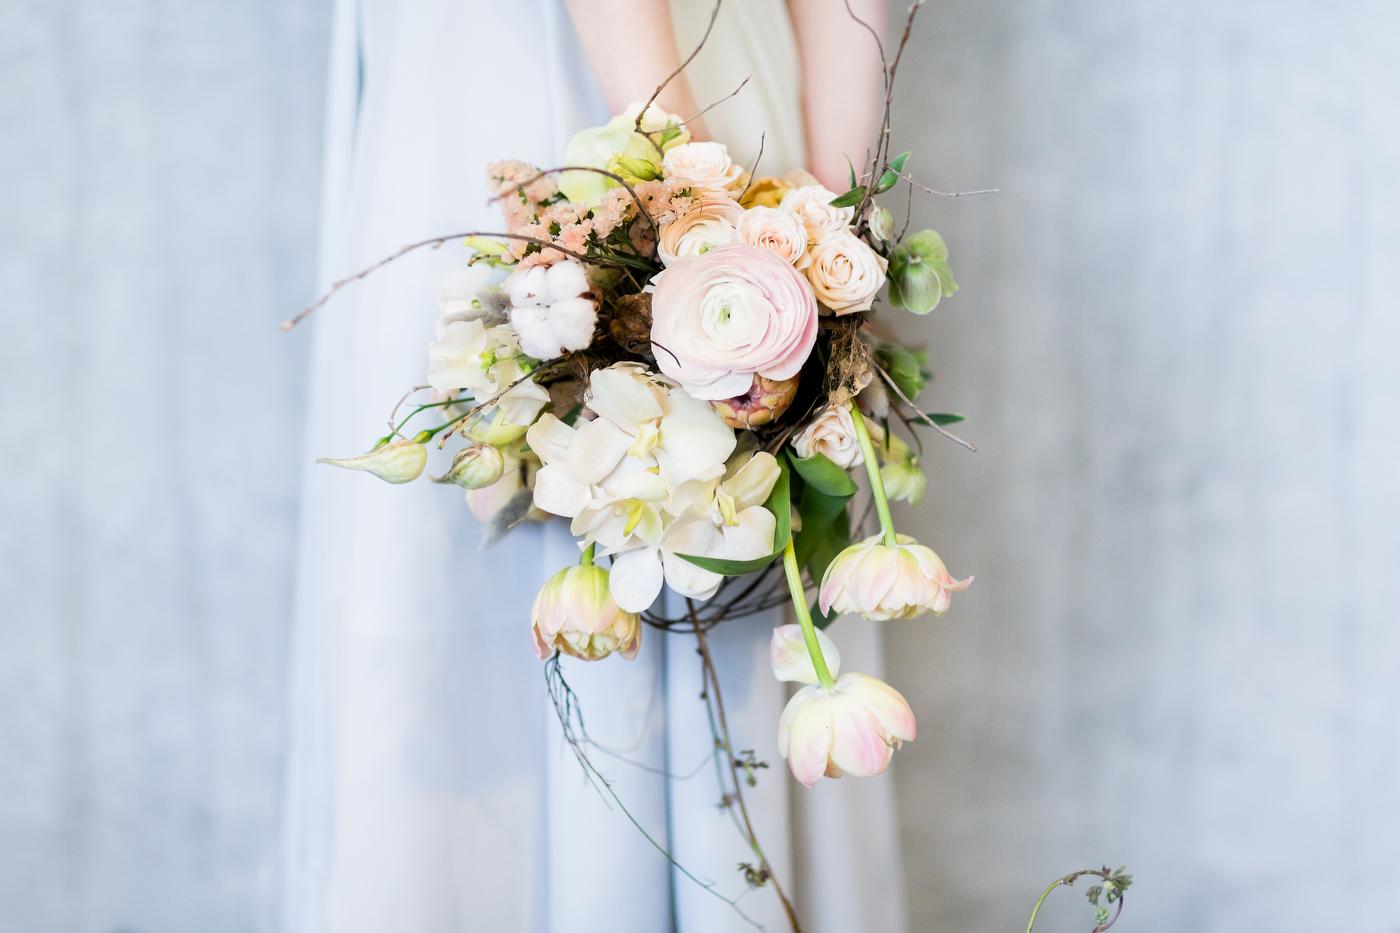 Brautstrauss mit Ranunkeln und Tulpen